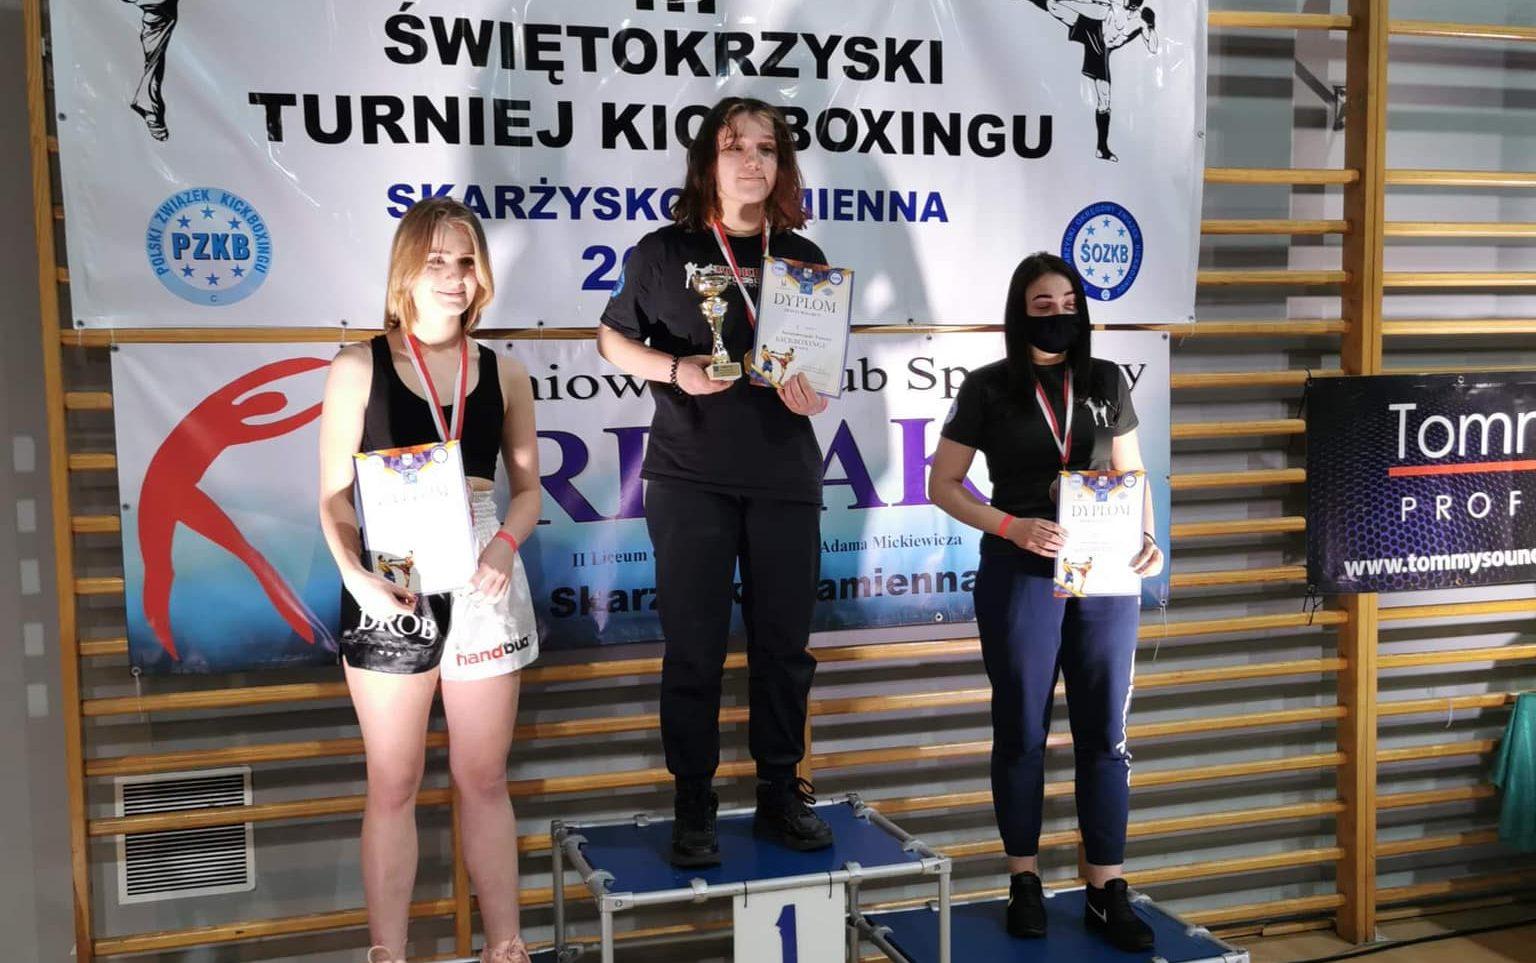 Zawody kickboxing